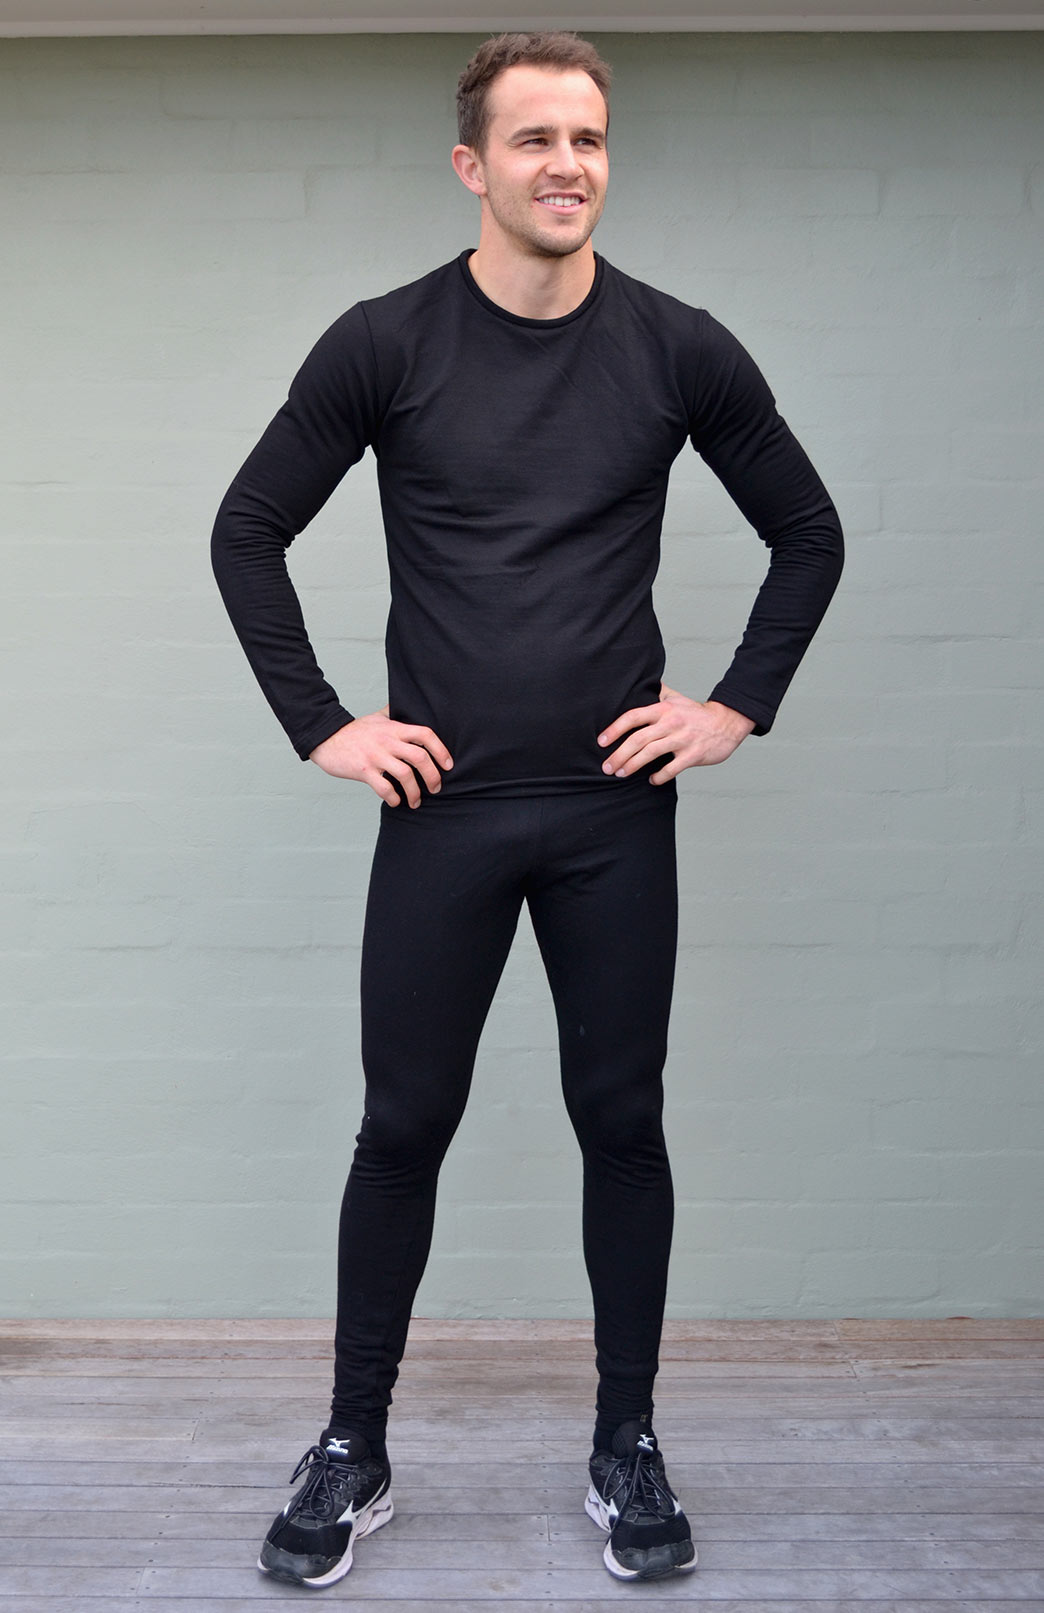 Leggings - 200g - Mens Black Lightweight Superfine Merino Wool Thermal Leggings - Smitten Merino Tasmania Australia